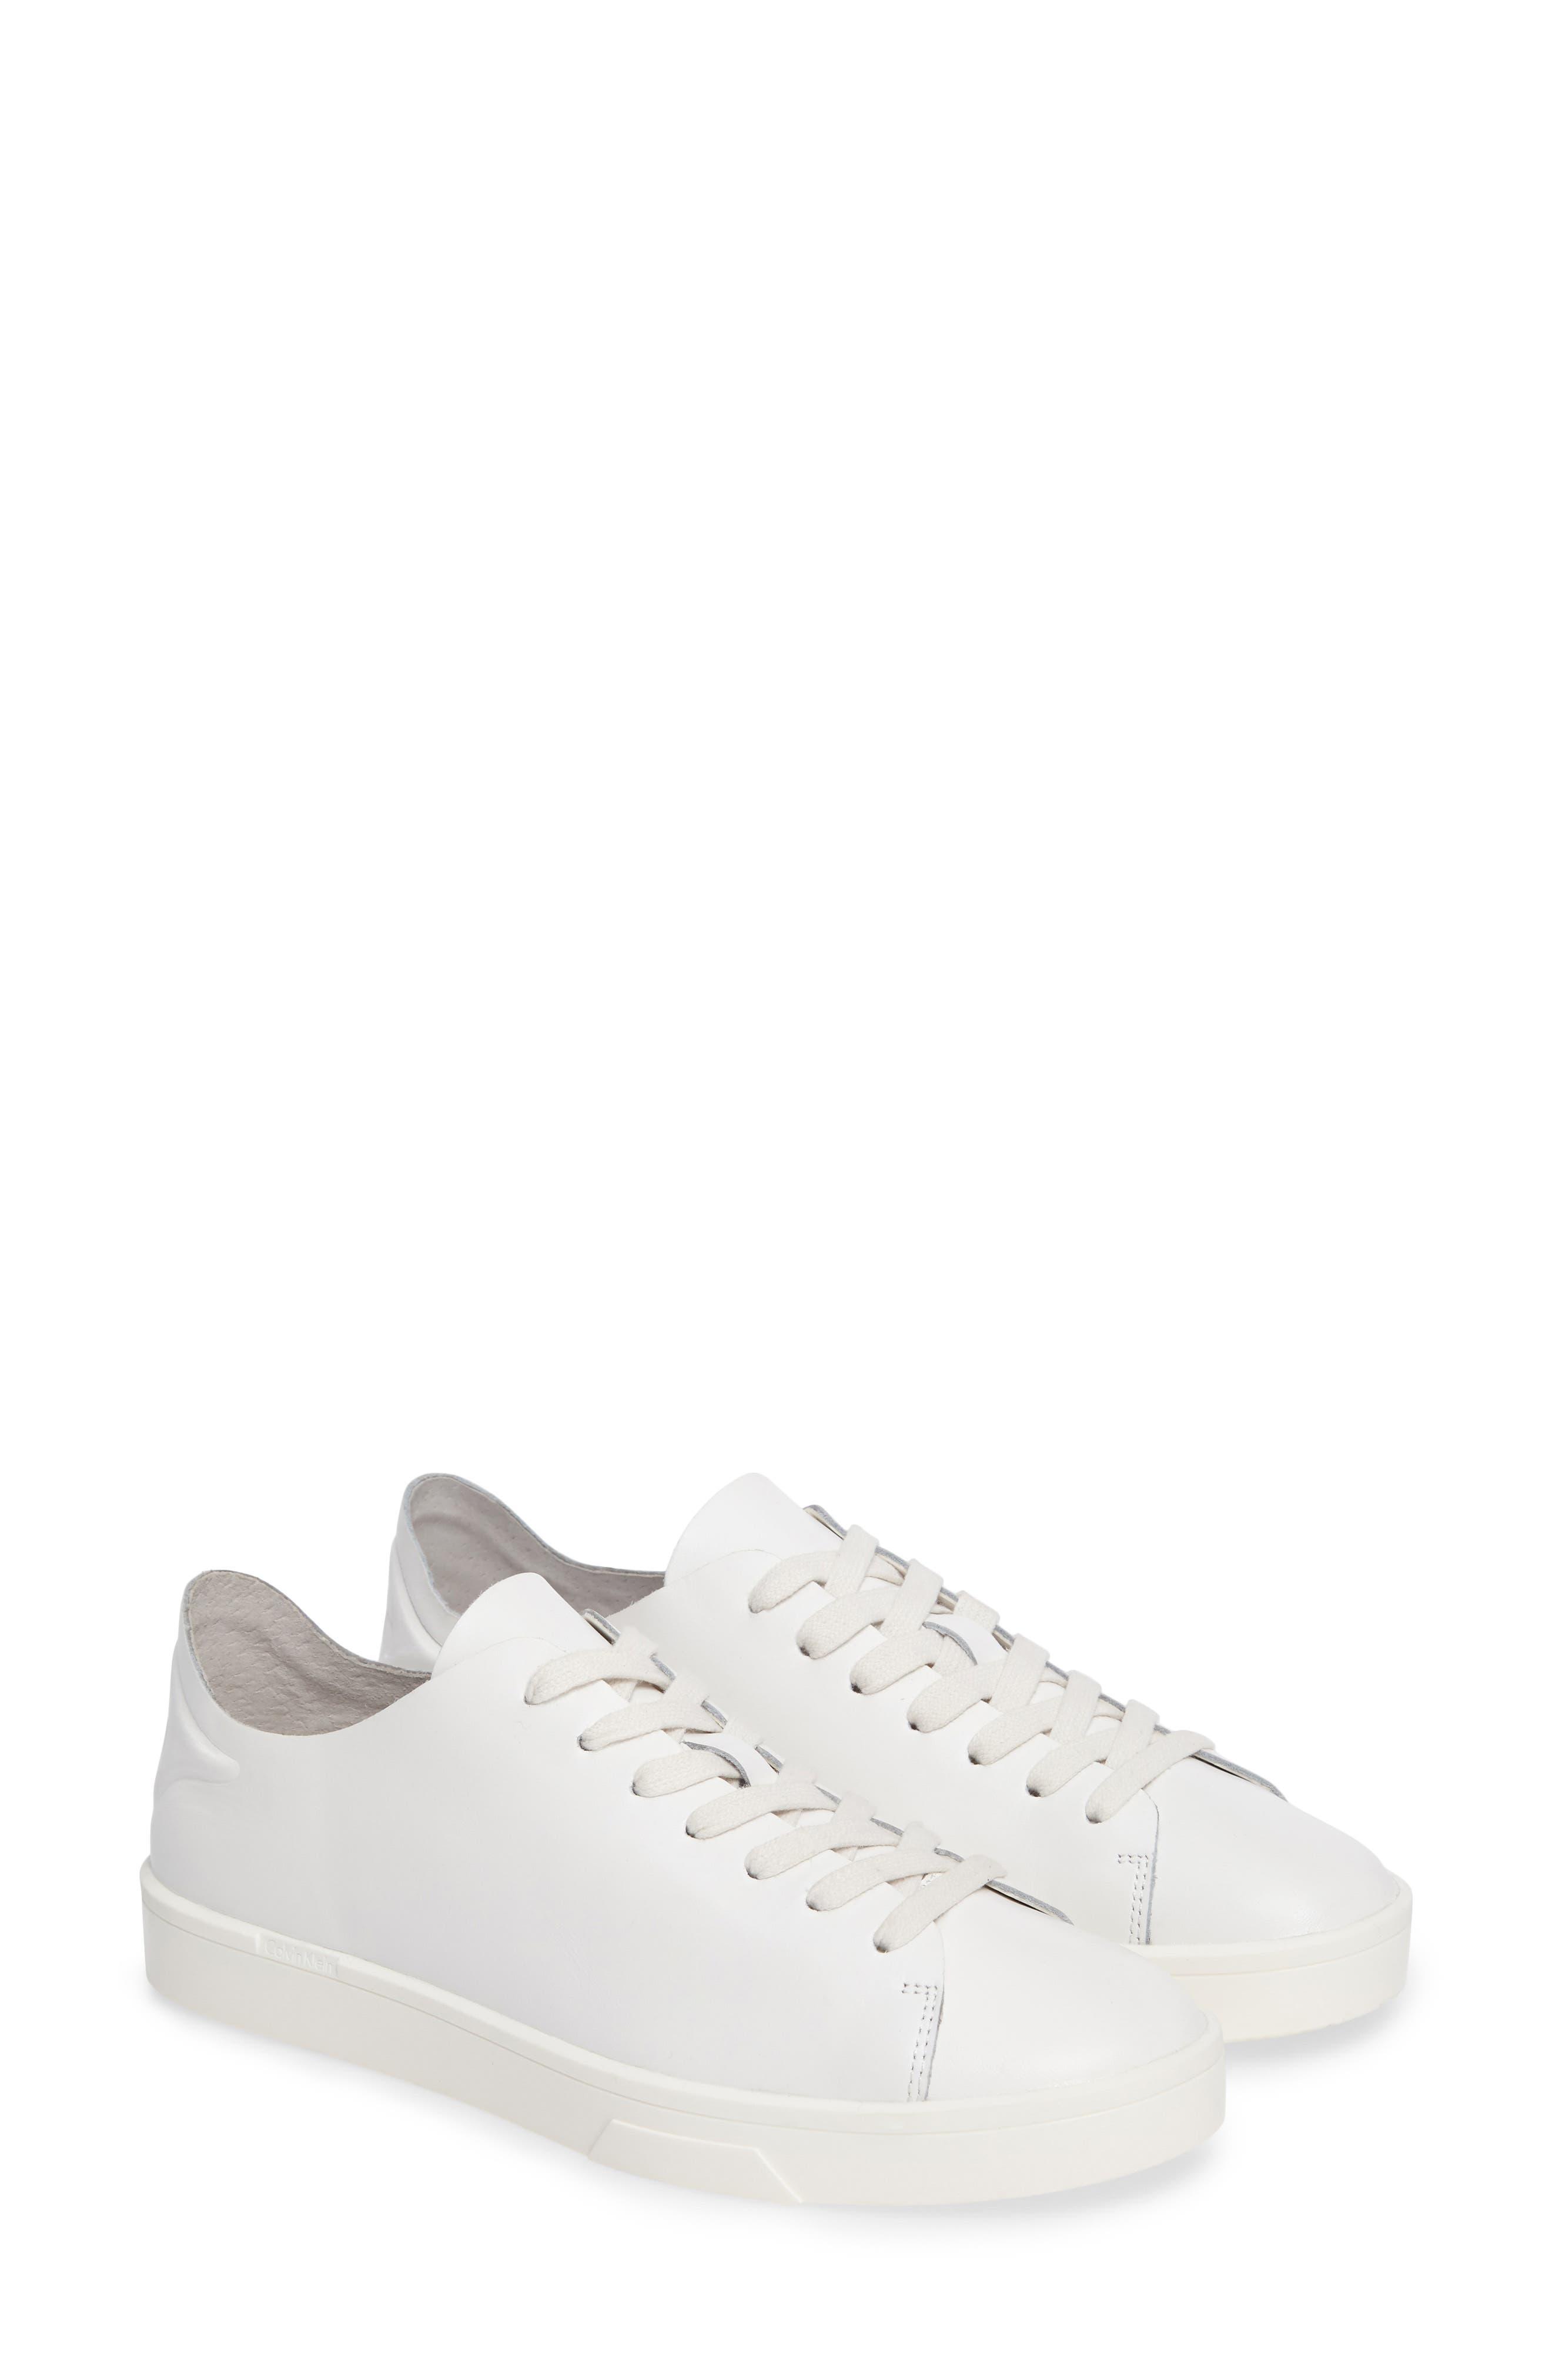 Irena Sneaker,                         Main,                         color, 134